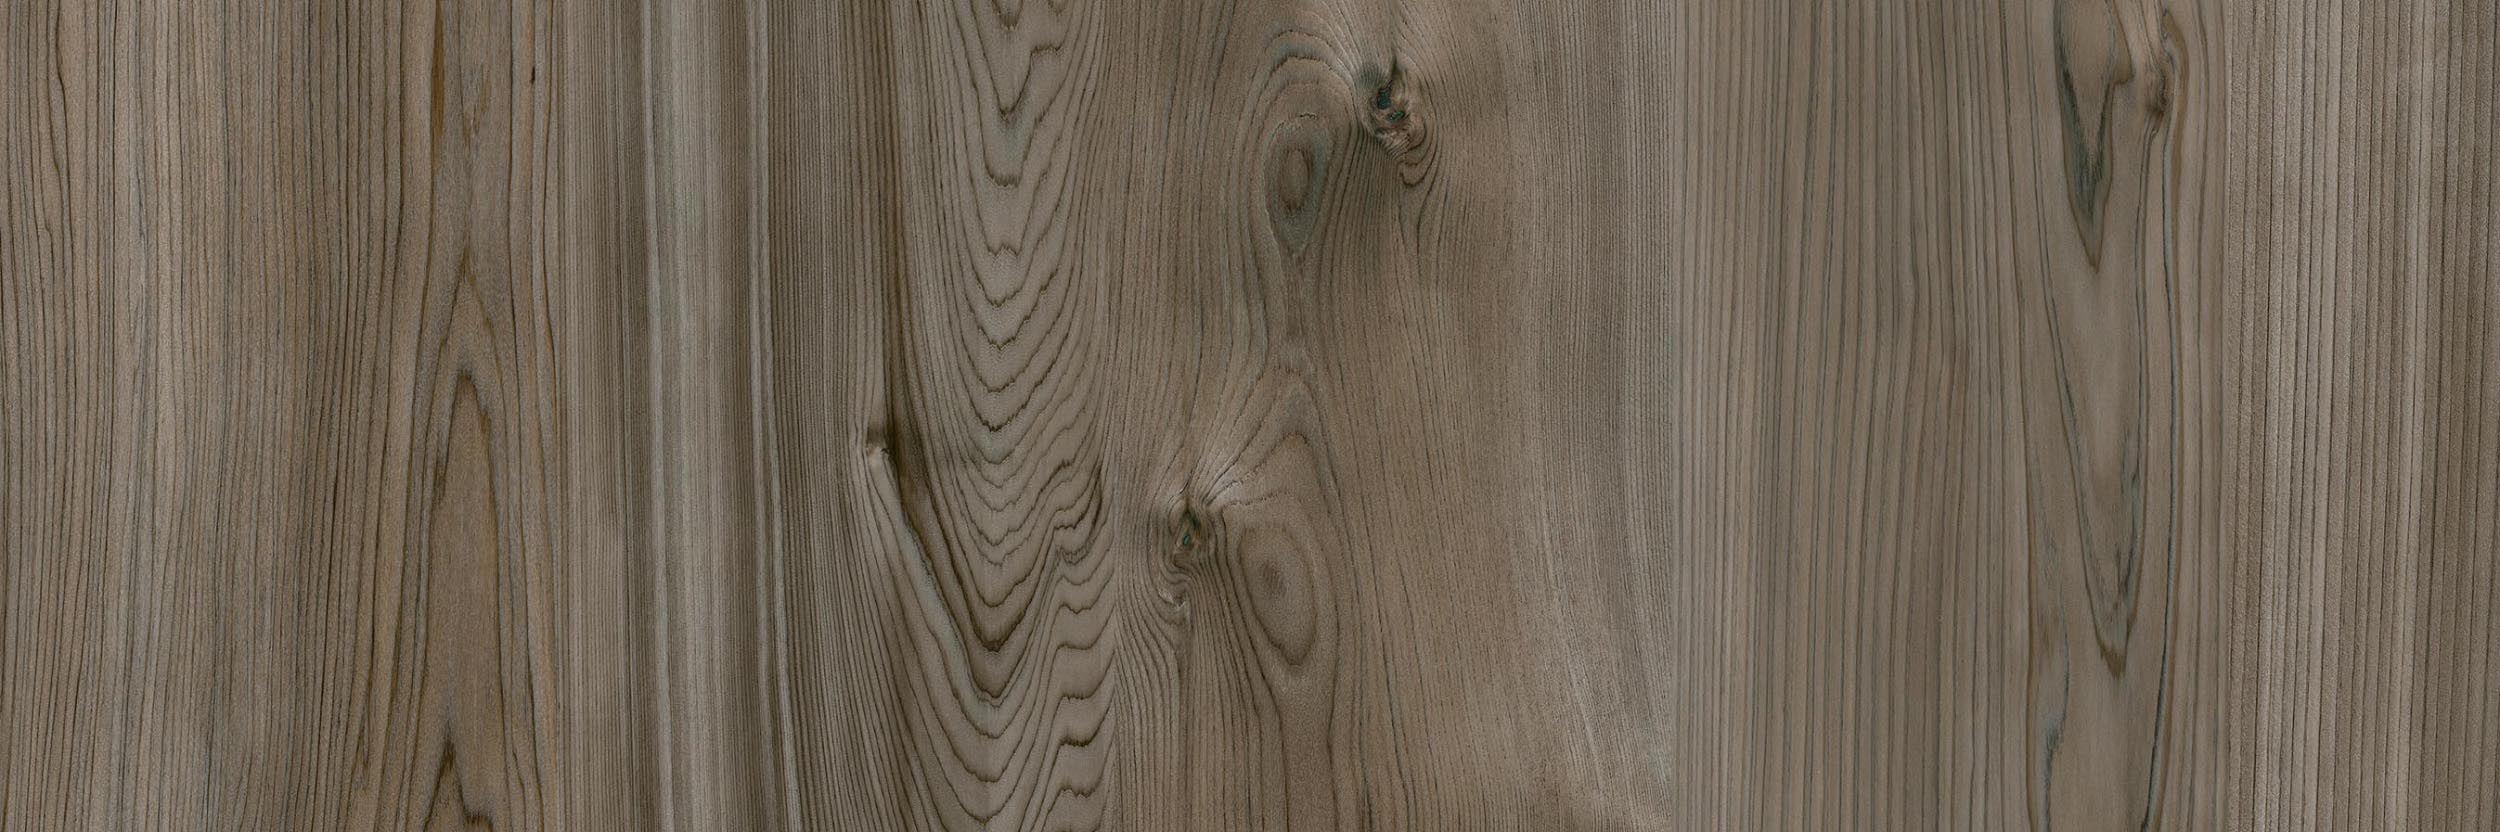 Grounded Hinoki Y0783 Laminate Countertops